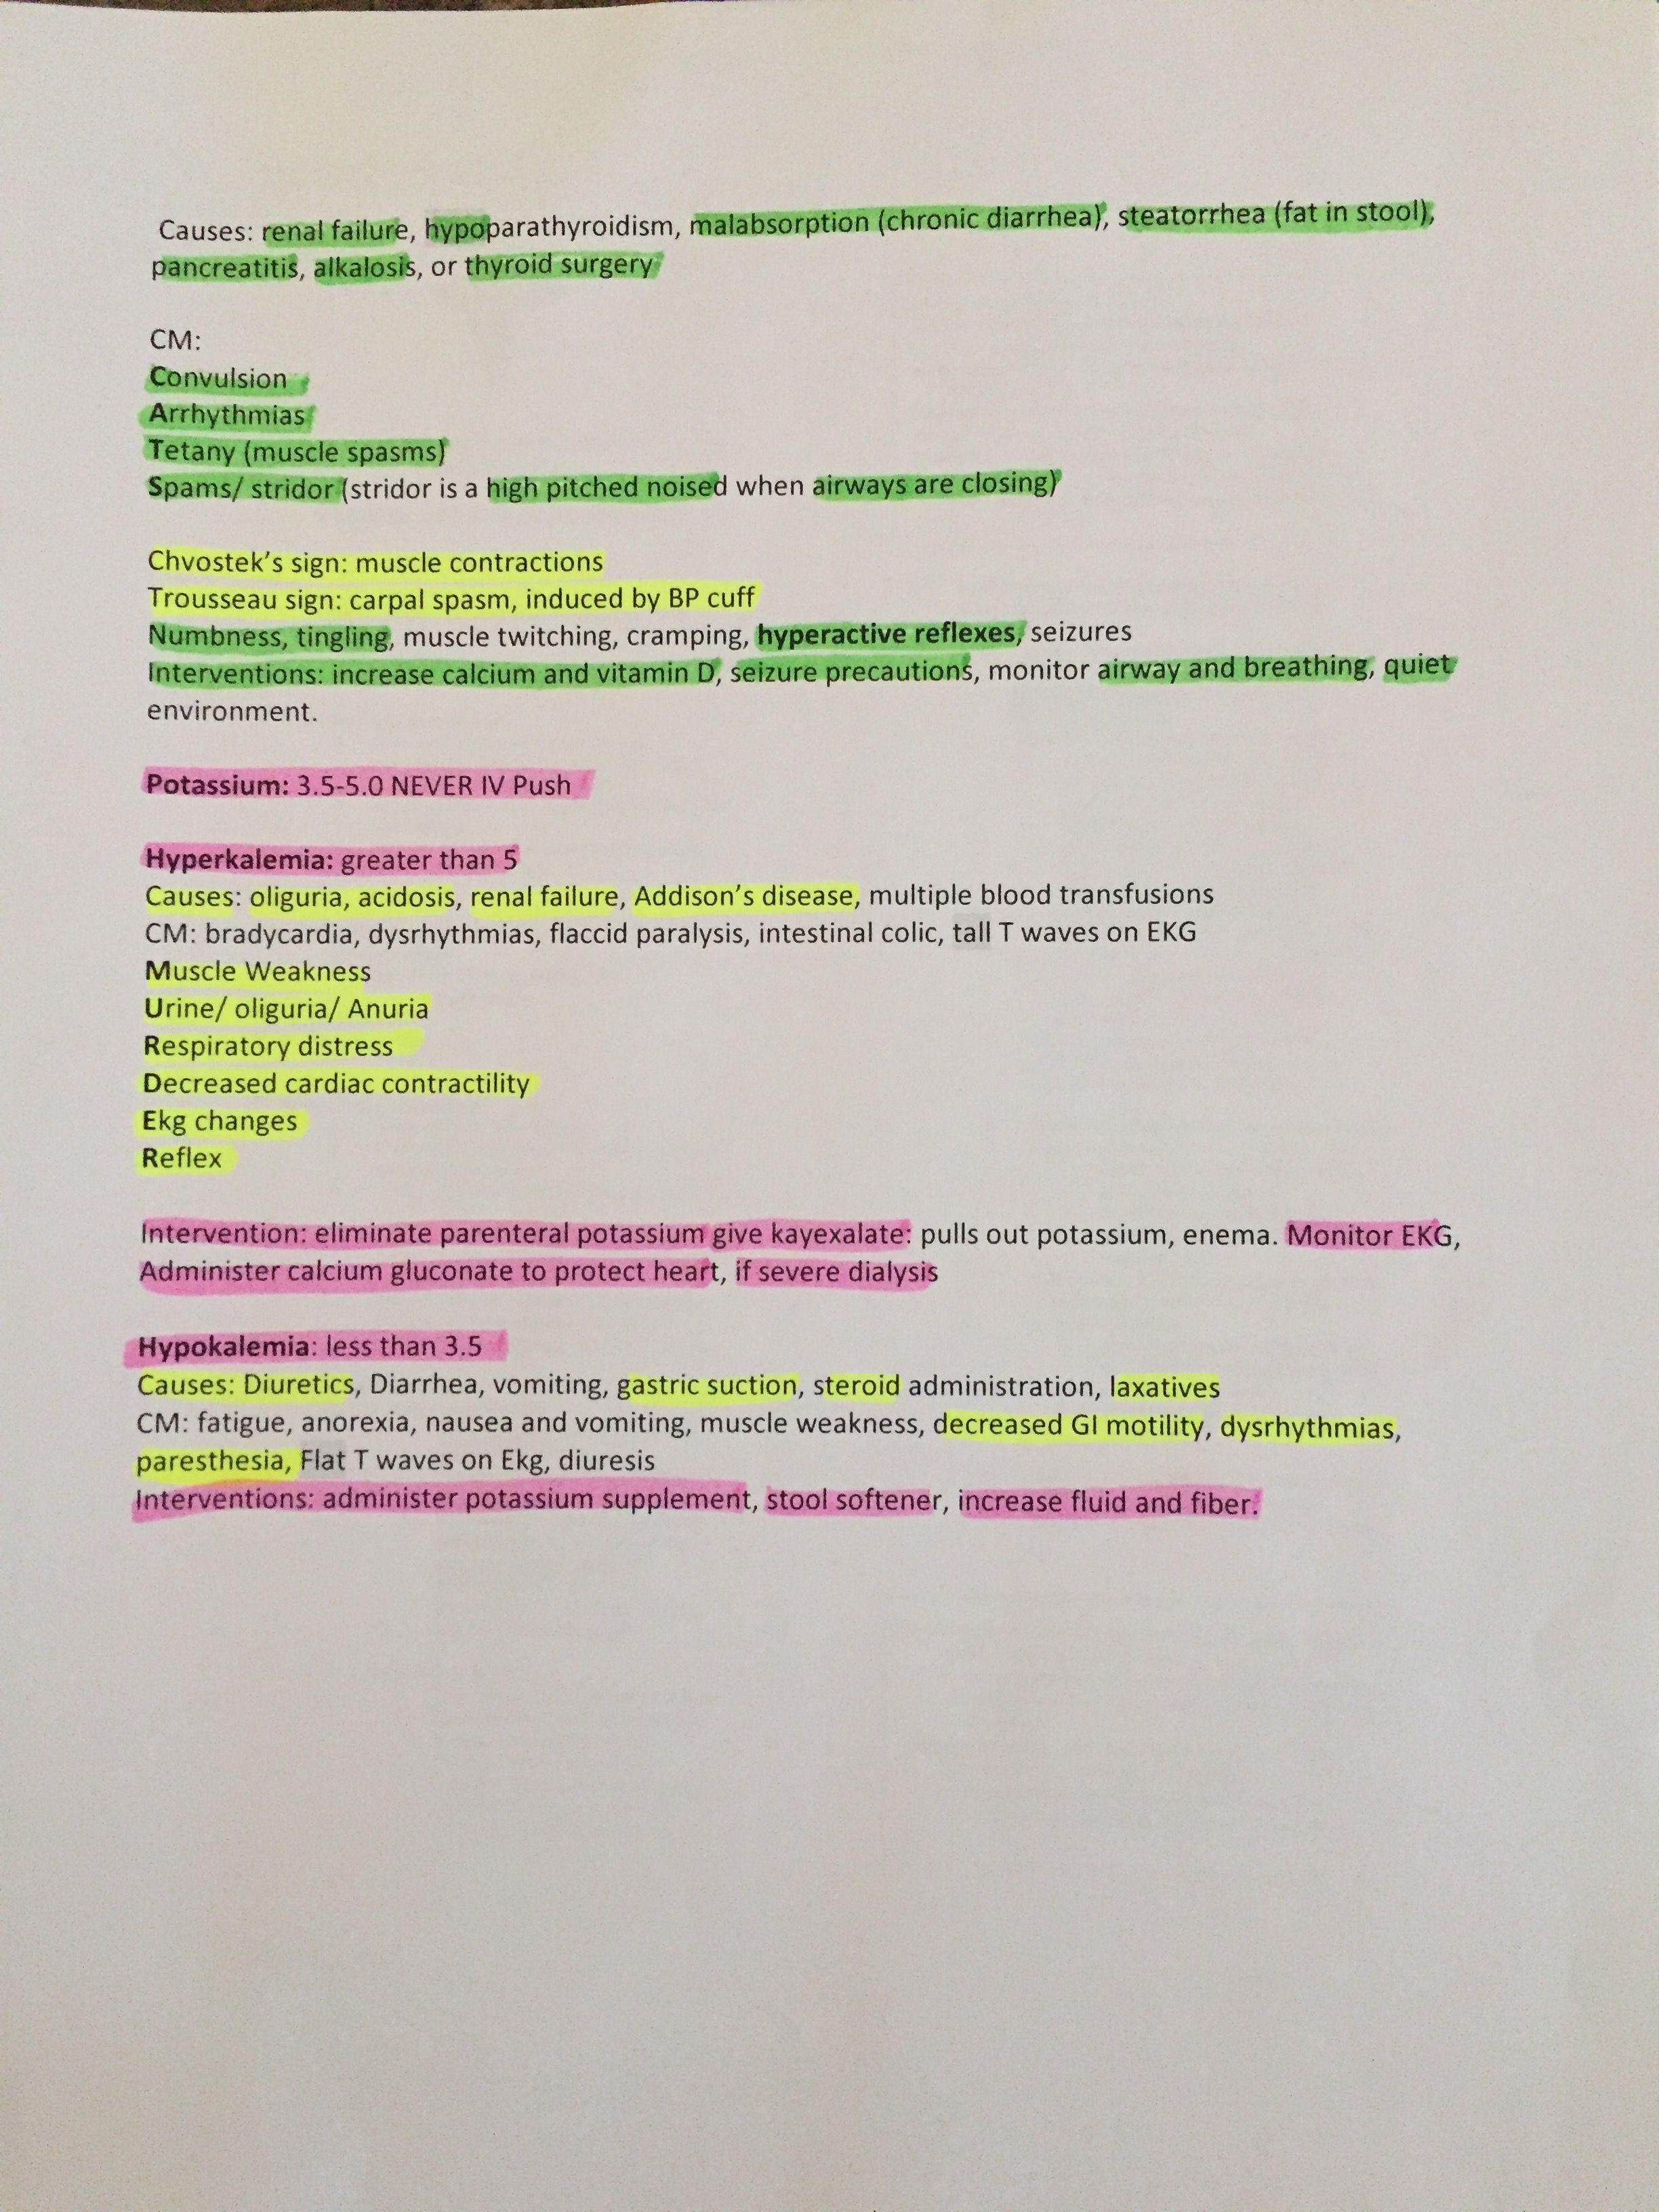 Pin by Amanda Coca on NCLEX Stuff | Nurse life, Fundamentals